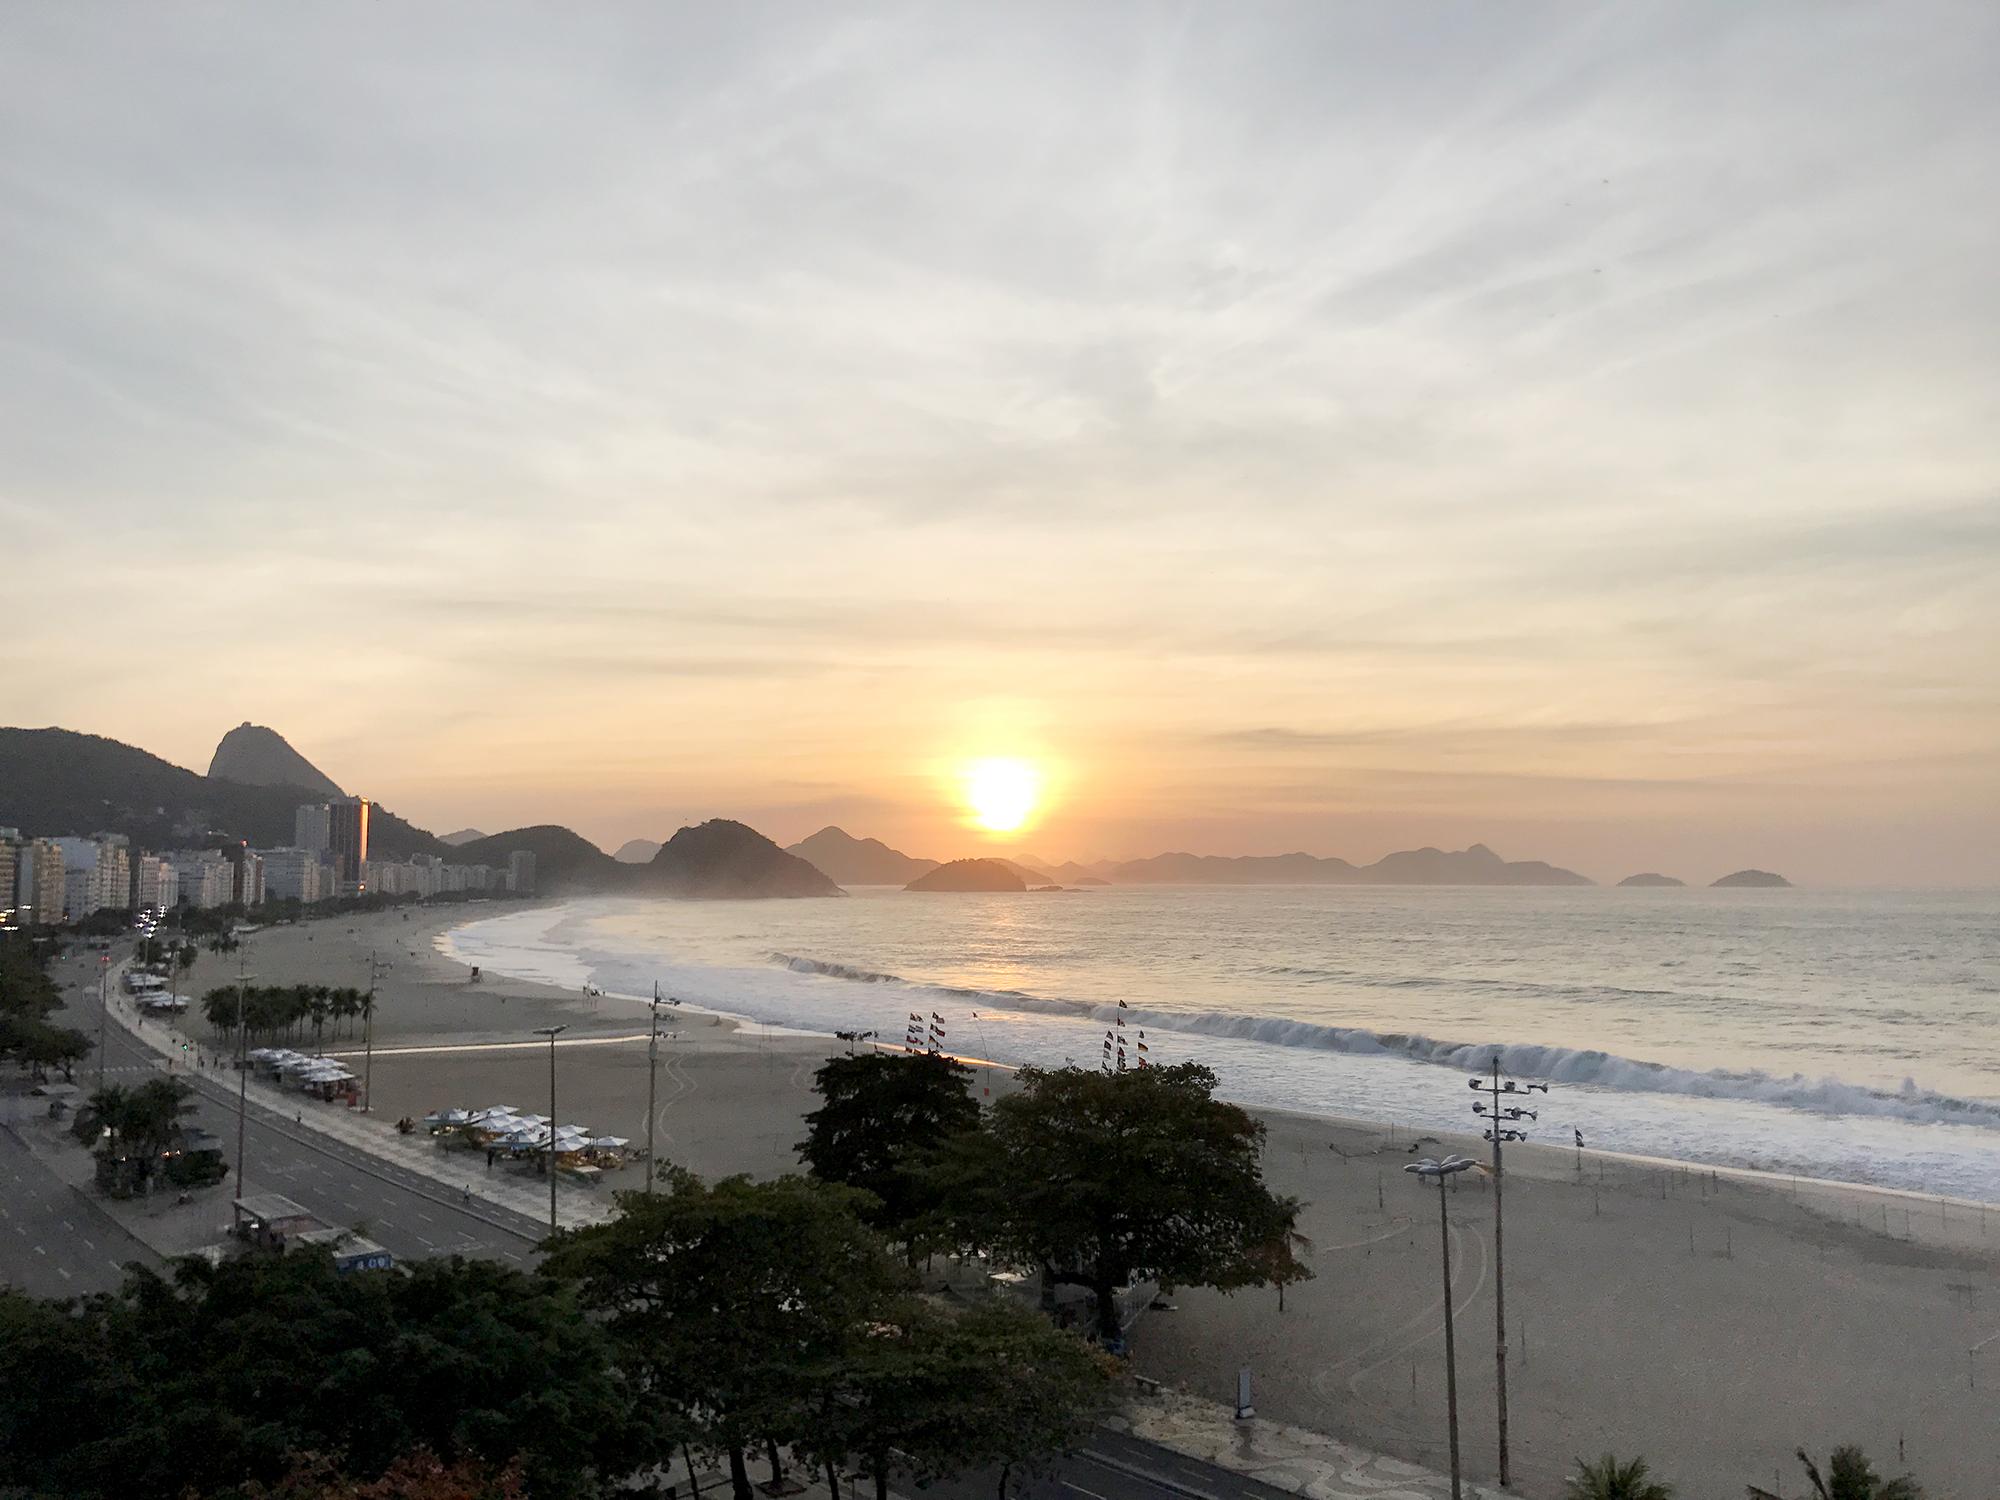 Amanecer en Copacabana